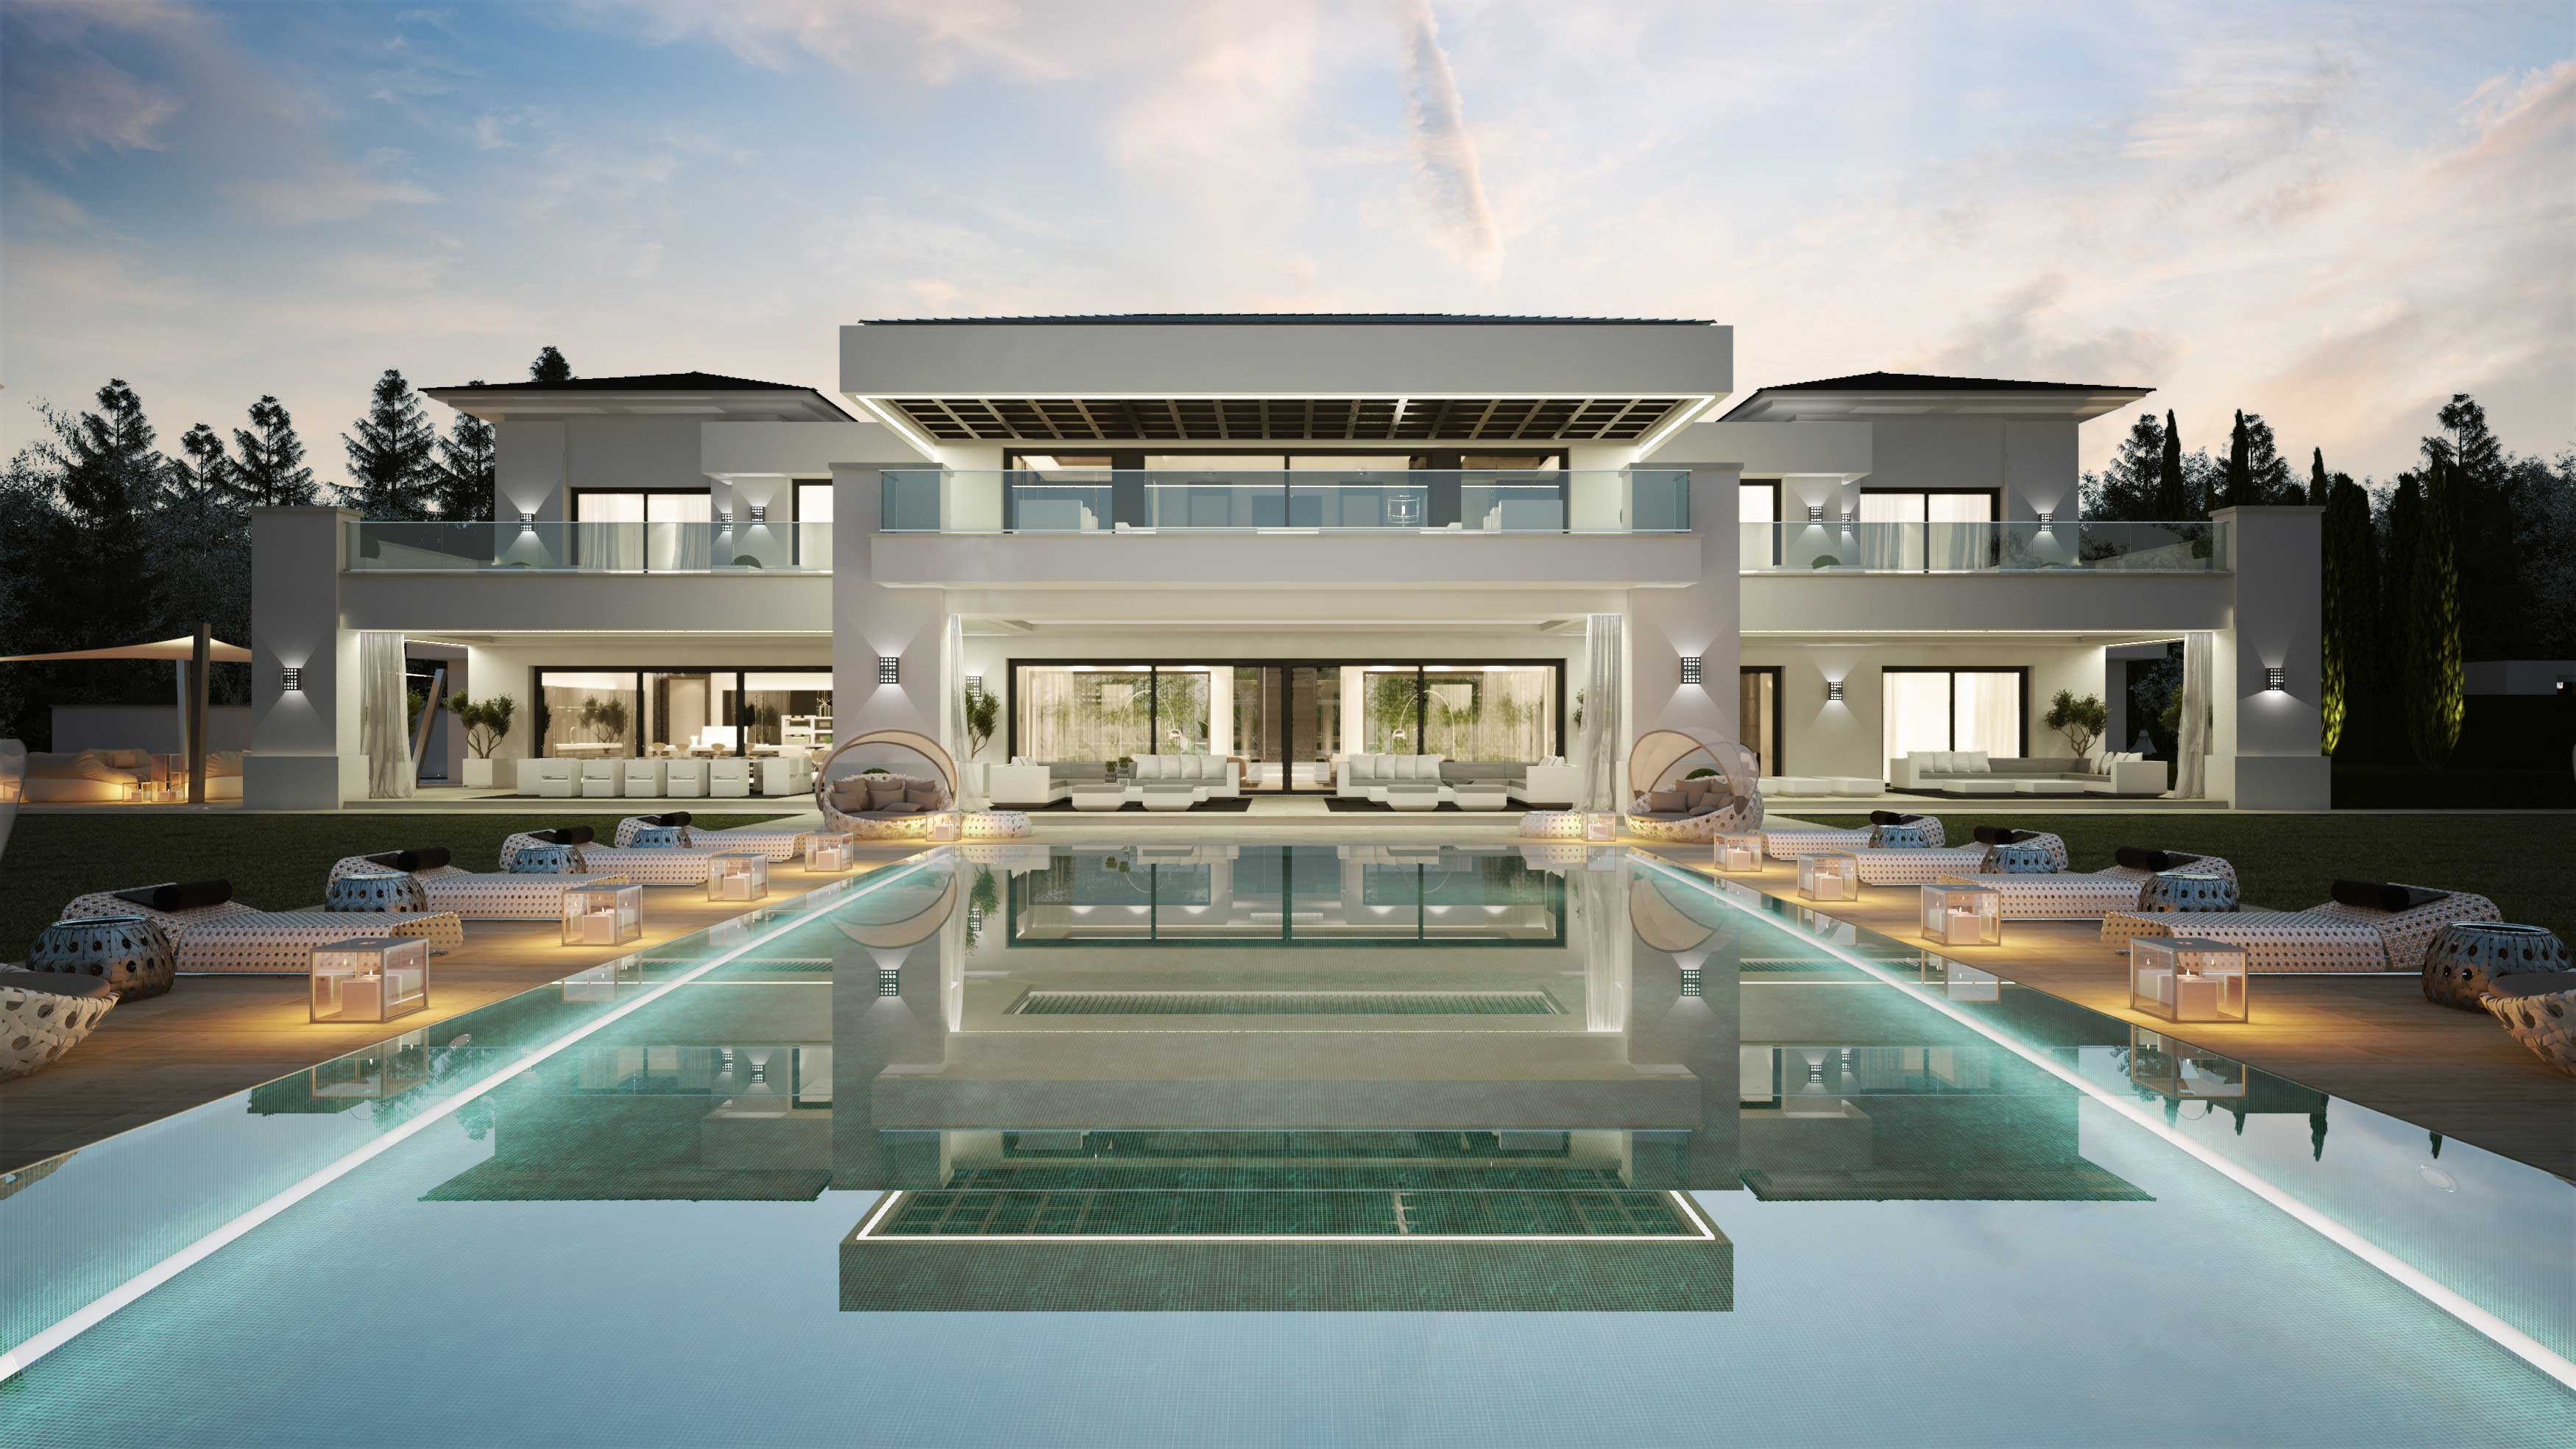 Maison avec piscine en espagne for Photo maison avec piscine